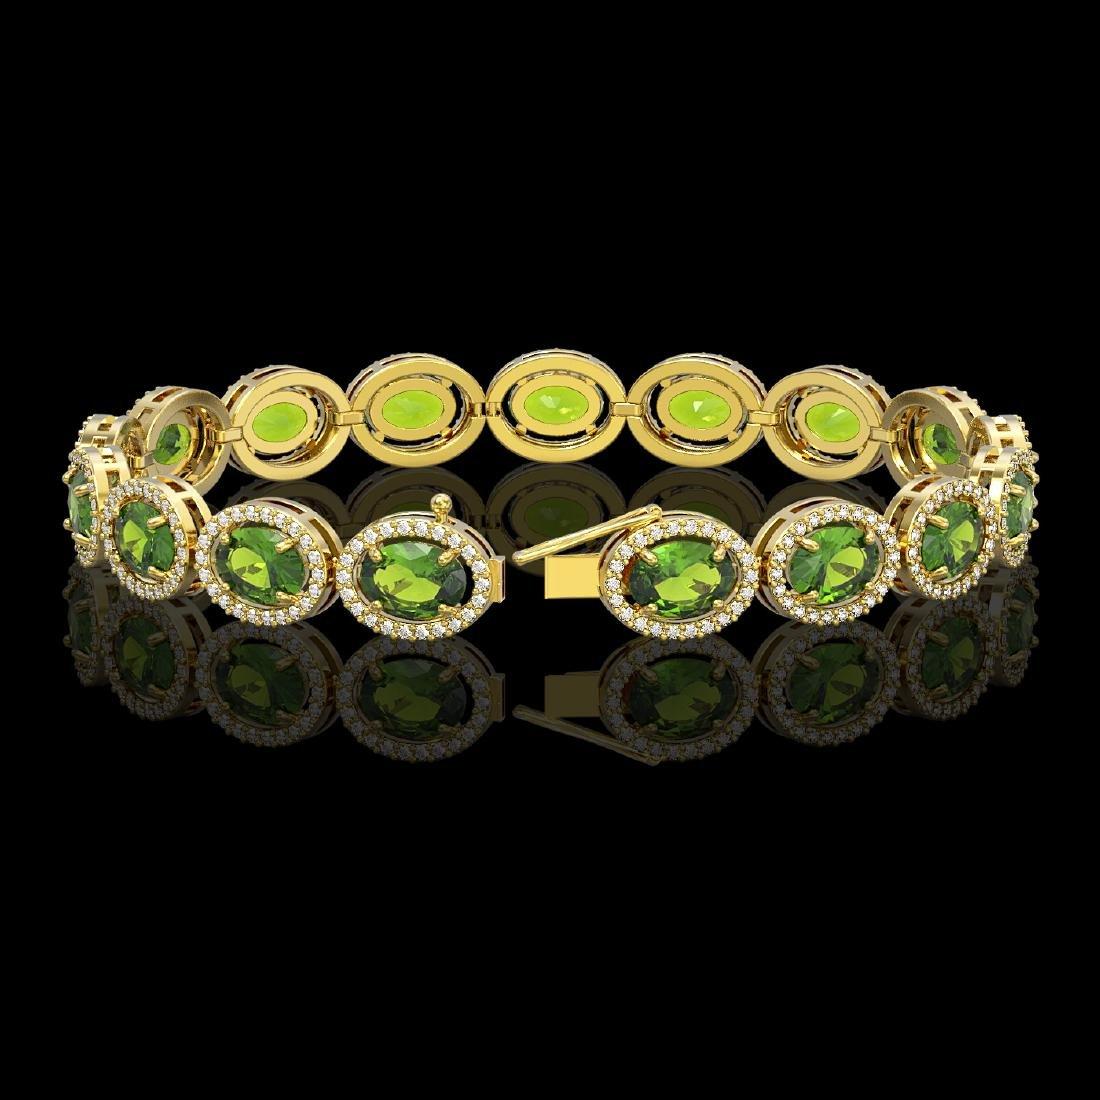 21.13 CTW Peridot & Diamond Halo Bracelet 10K Yellow - 2